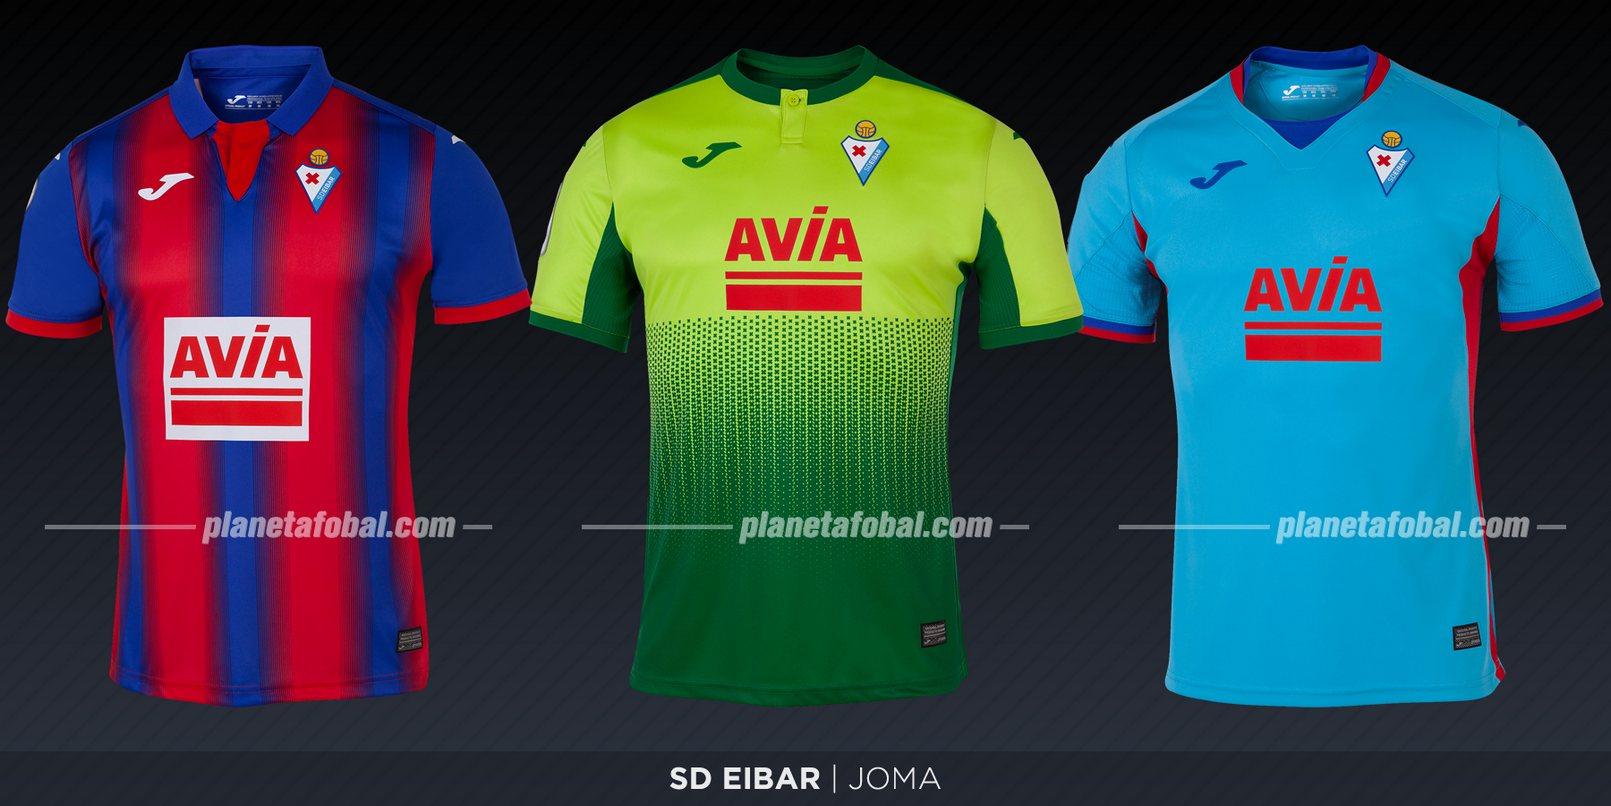 SD Eibar (Joma) | Camisetas de LaLiga 2019-2020